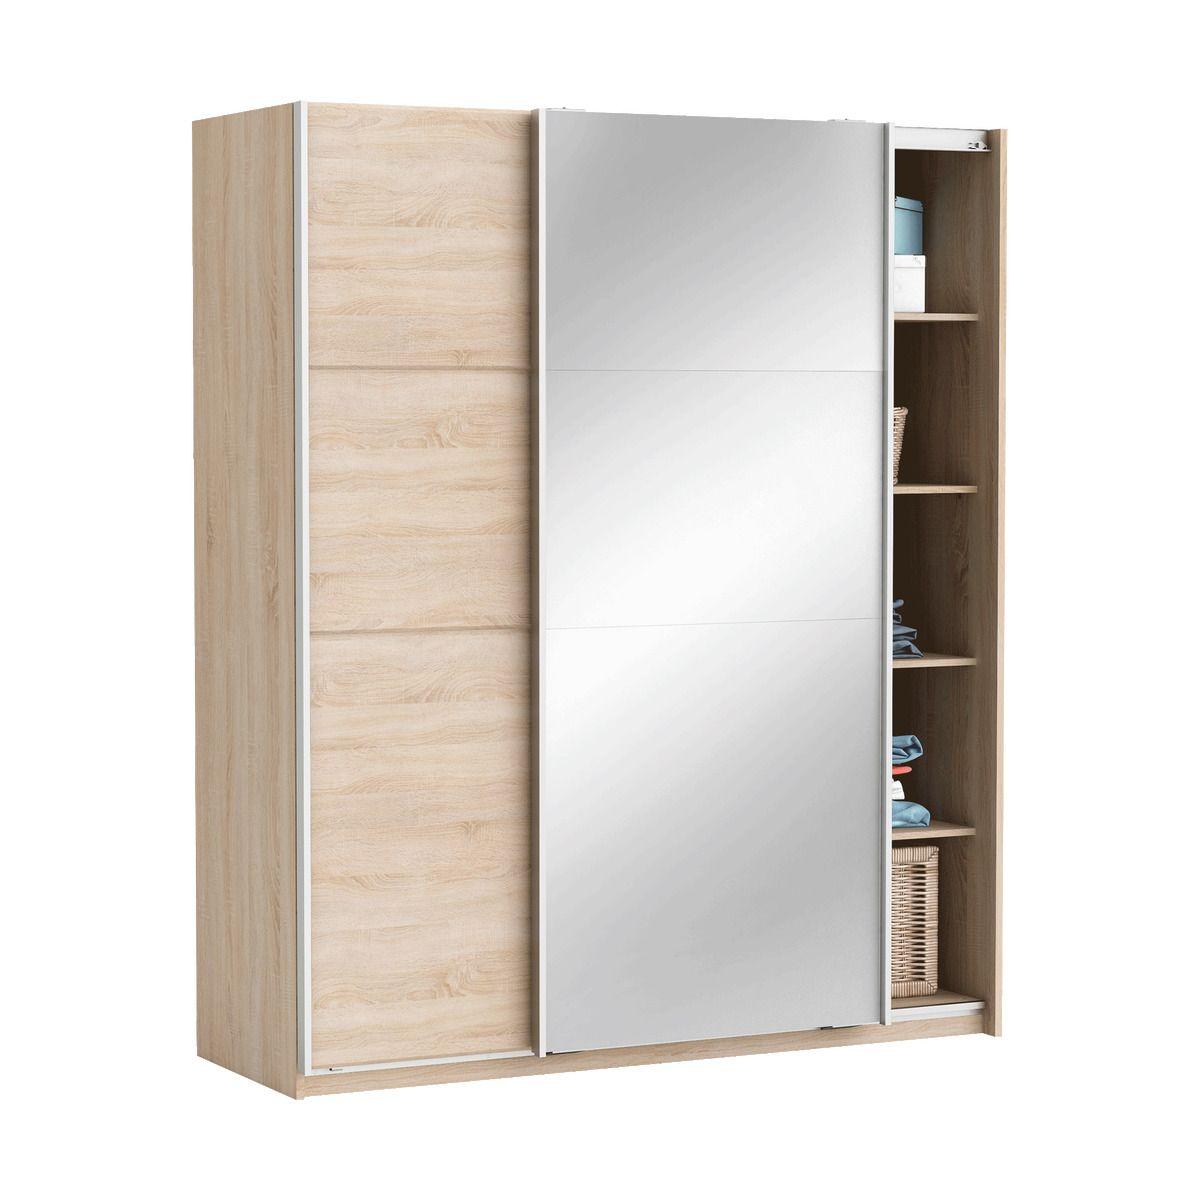 Epingle Sur Home Interior Design Ideas Cozy